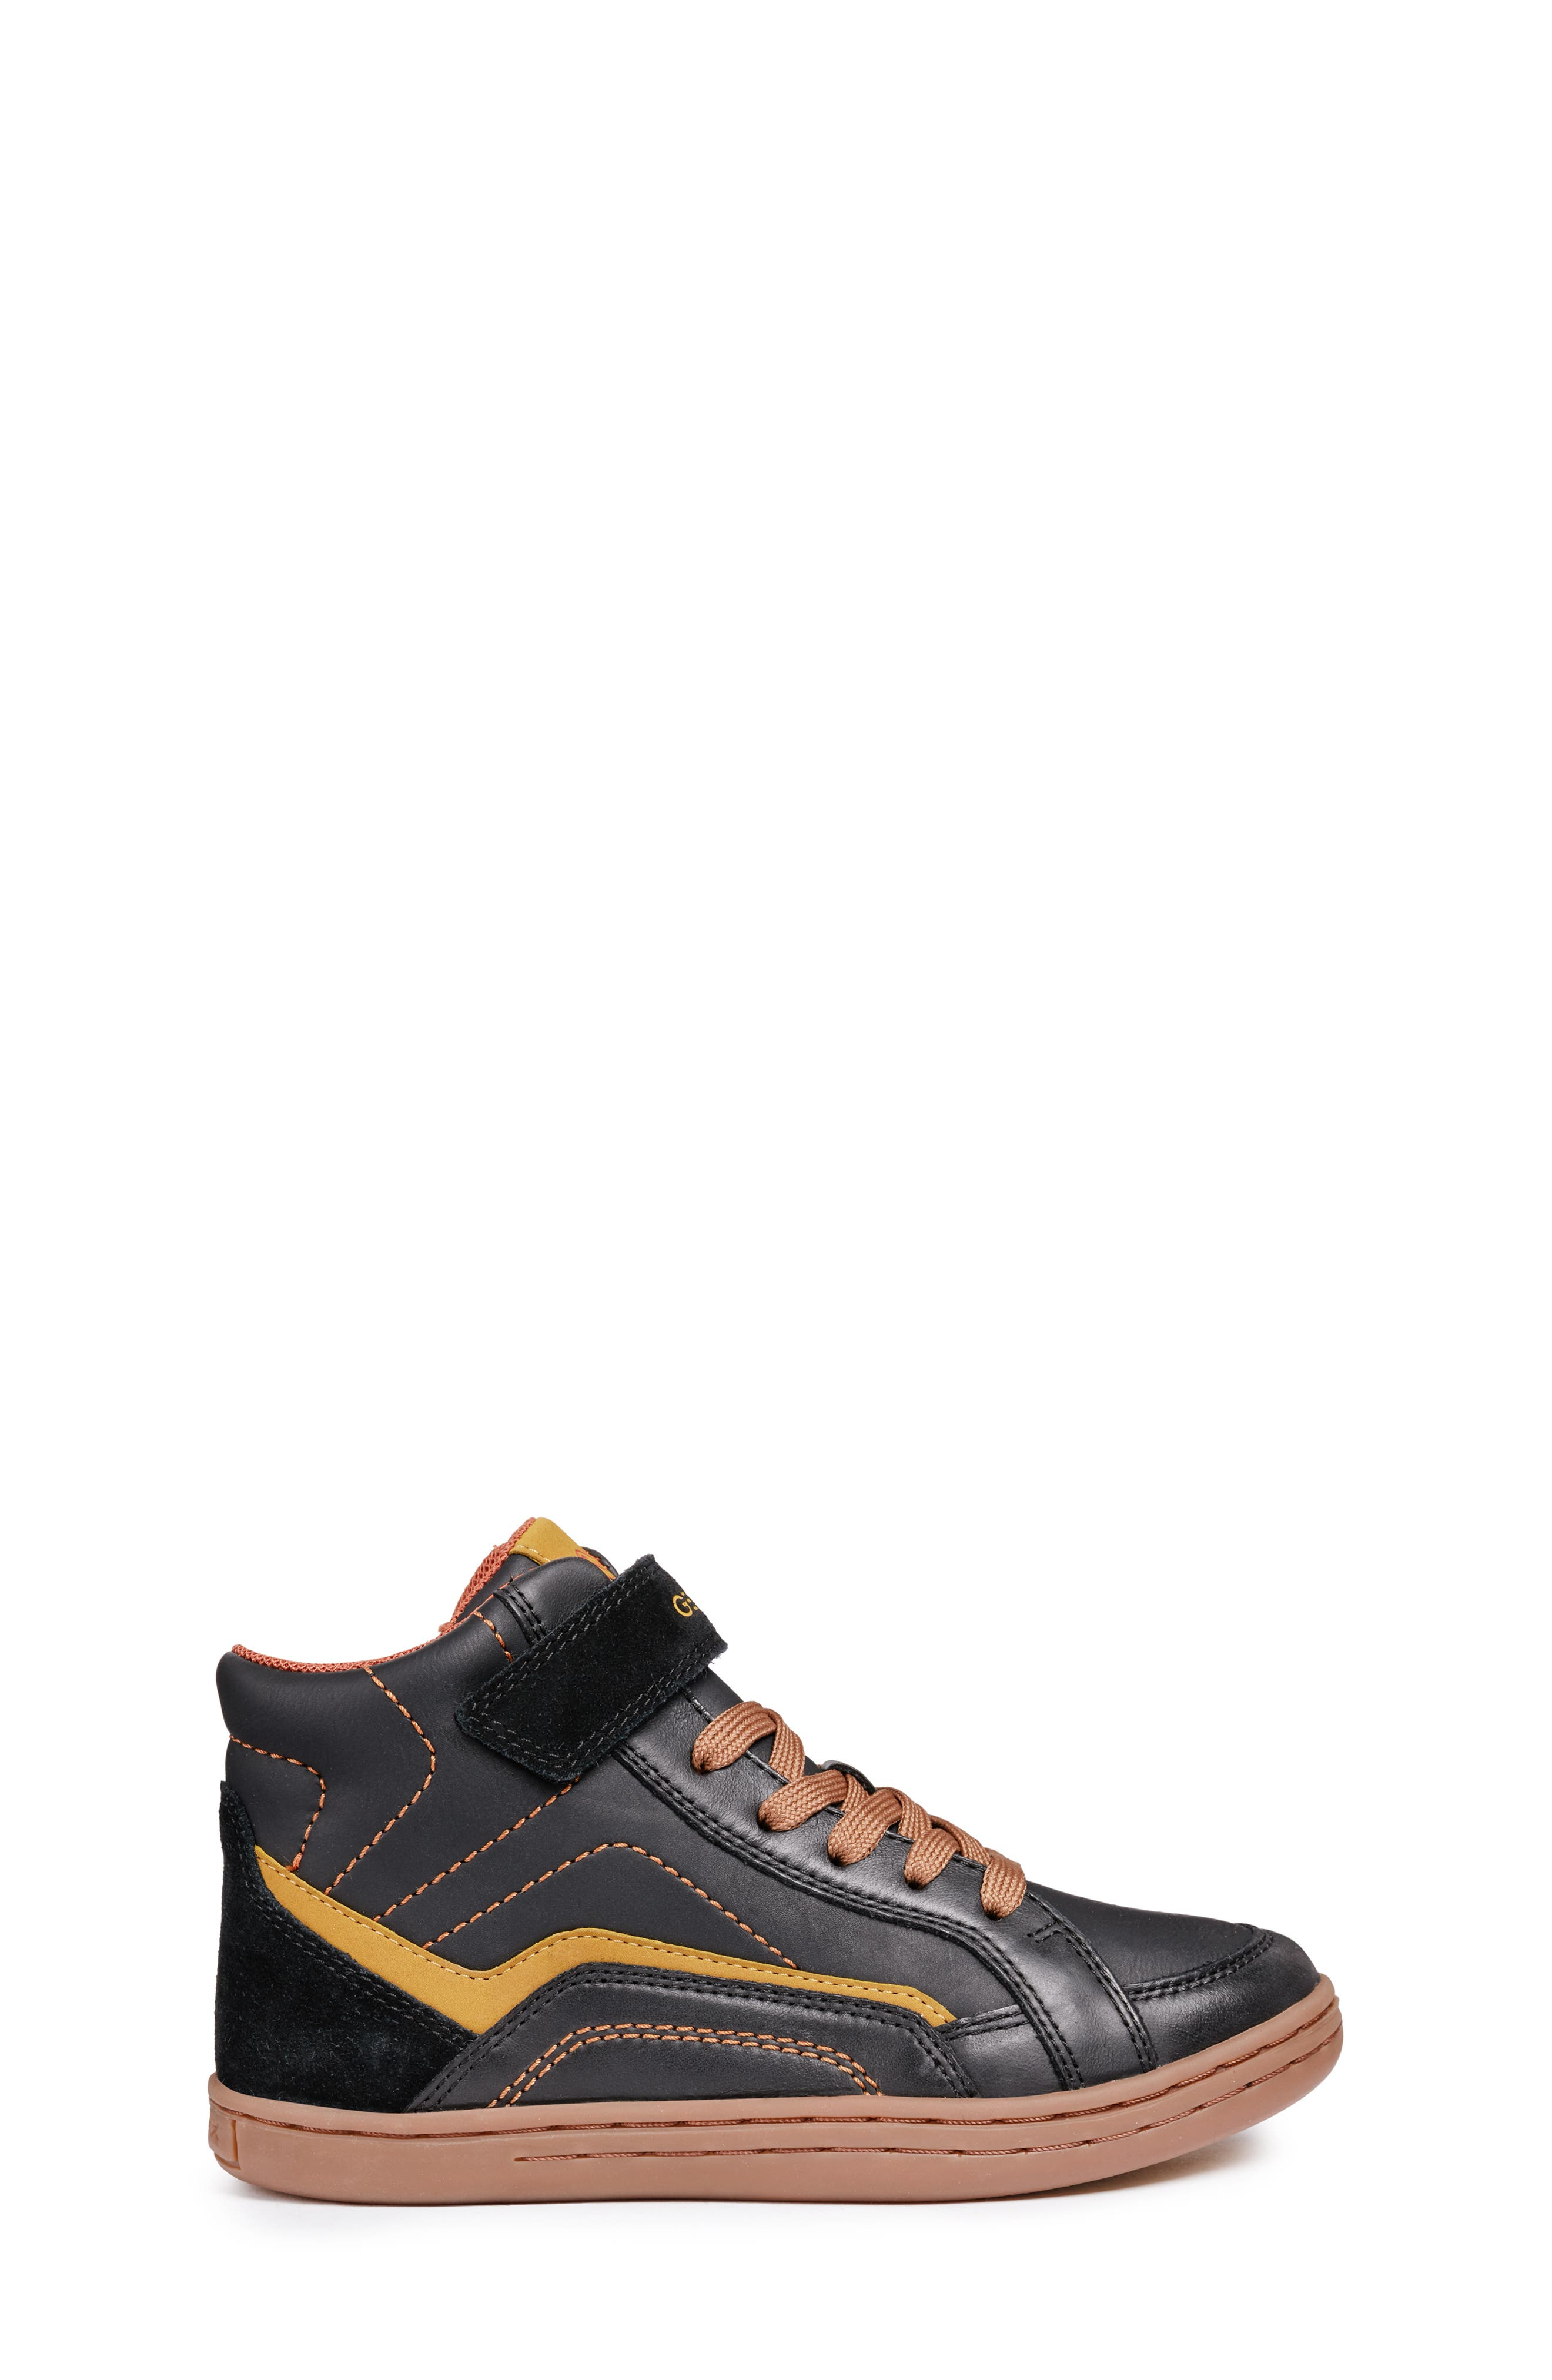 Garcia Mid Sneaker,                             Alternate thumbnail 3, color,                             BLACK/ DARK YELLOW